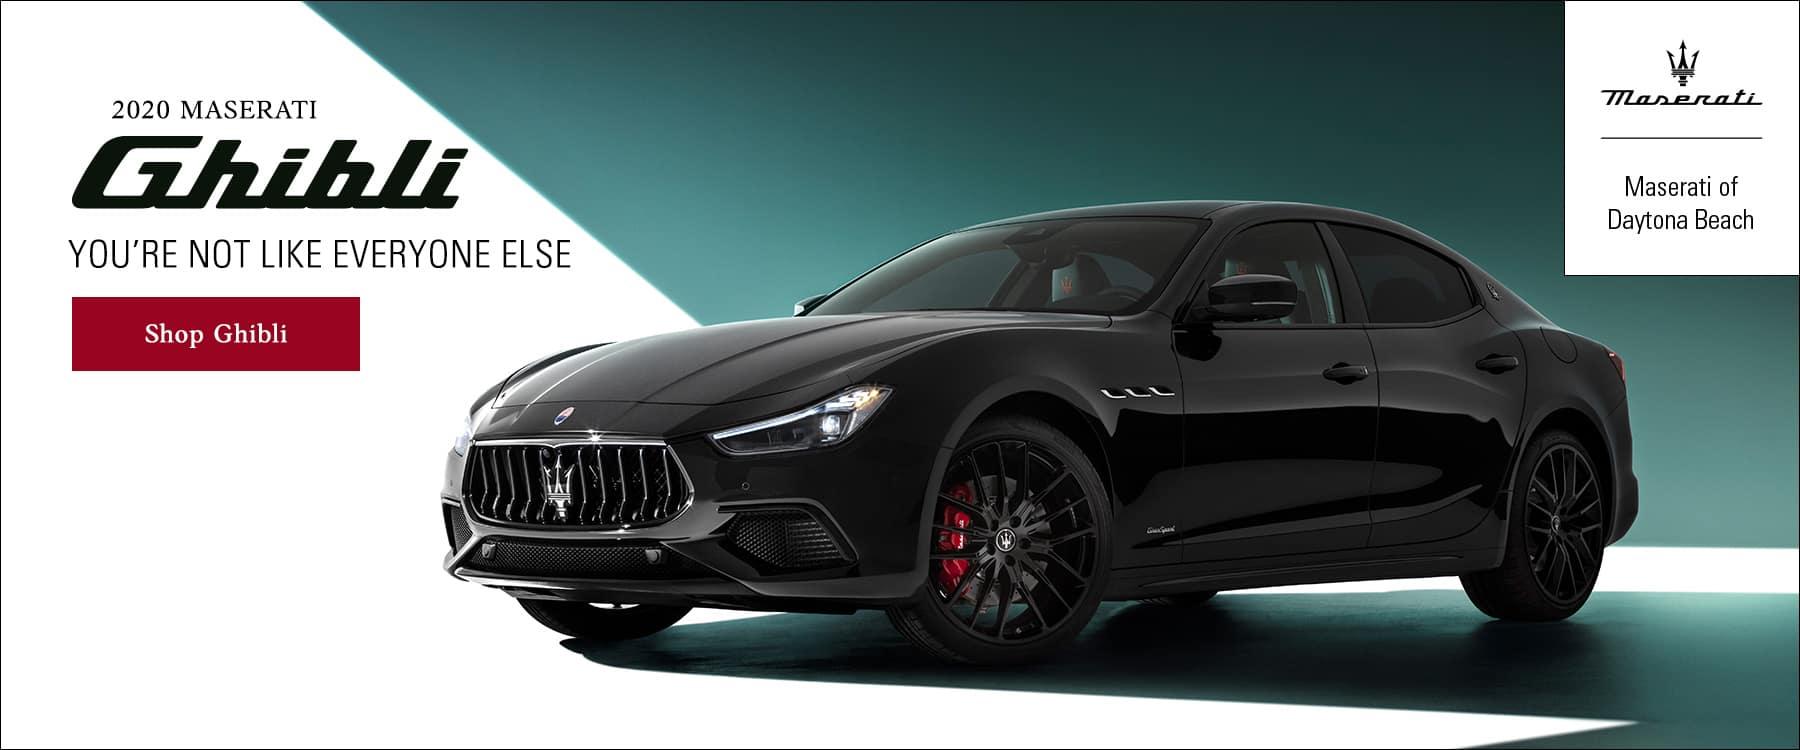 DMAR-2021-Maserati-1800×750-MY20-Ghibli-Evergreen